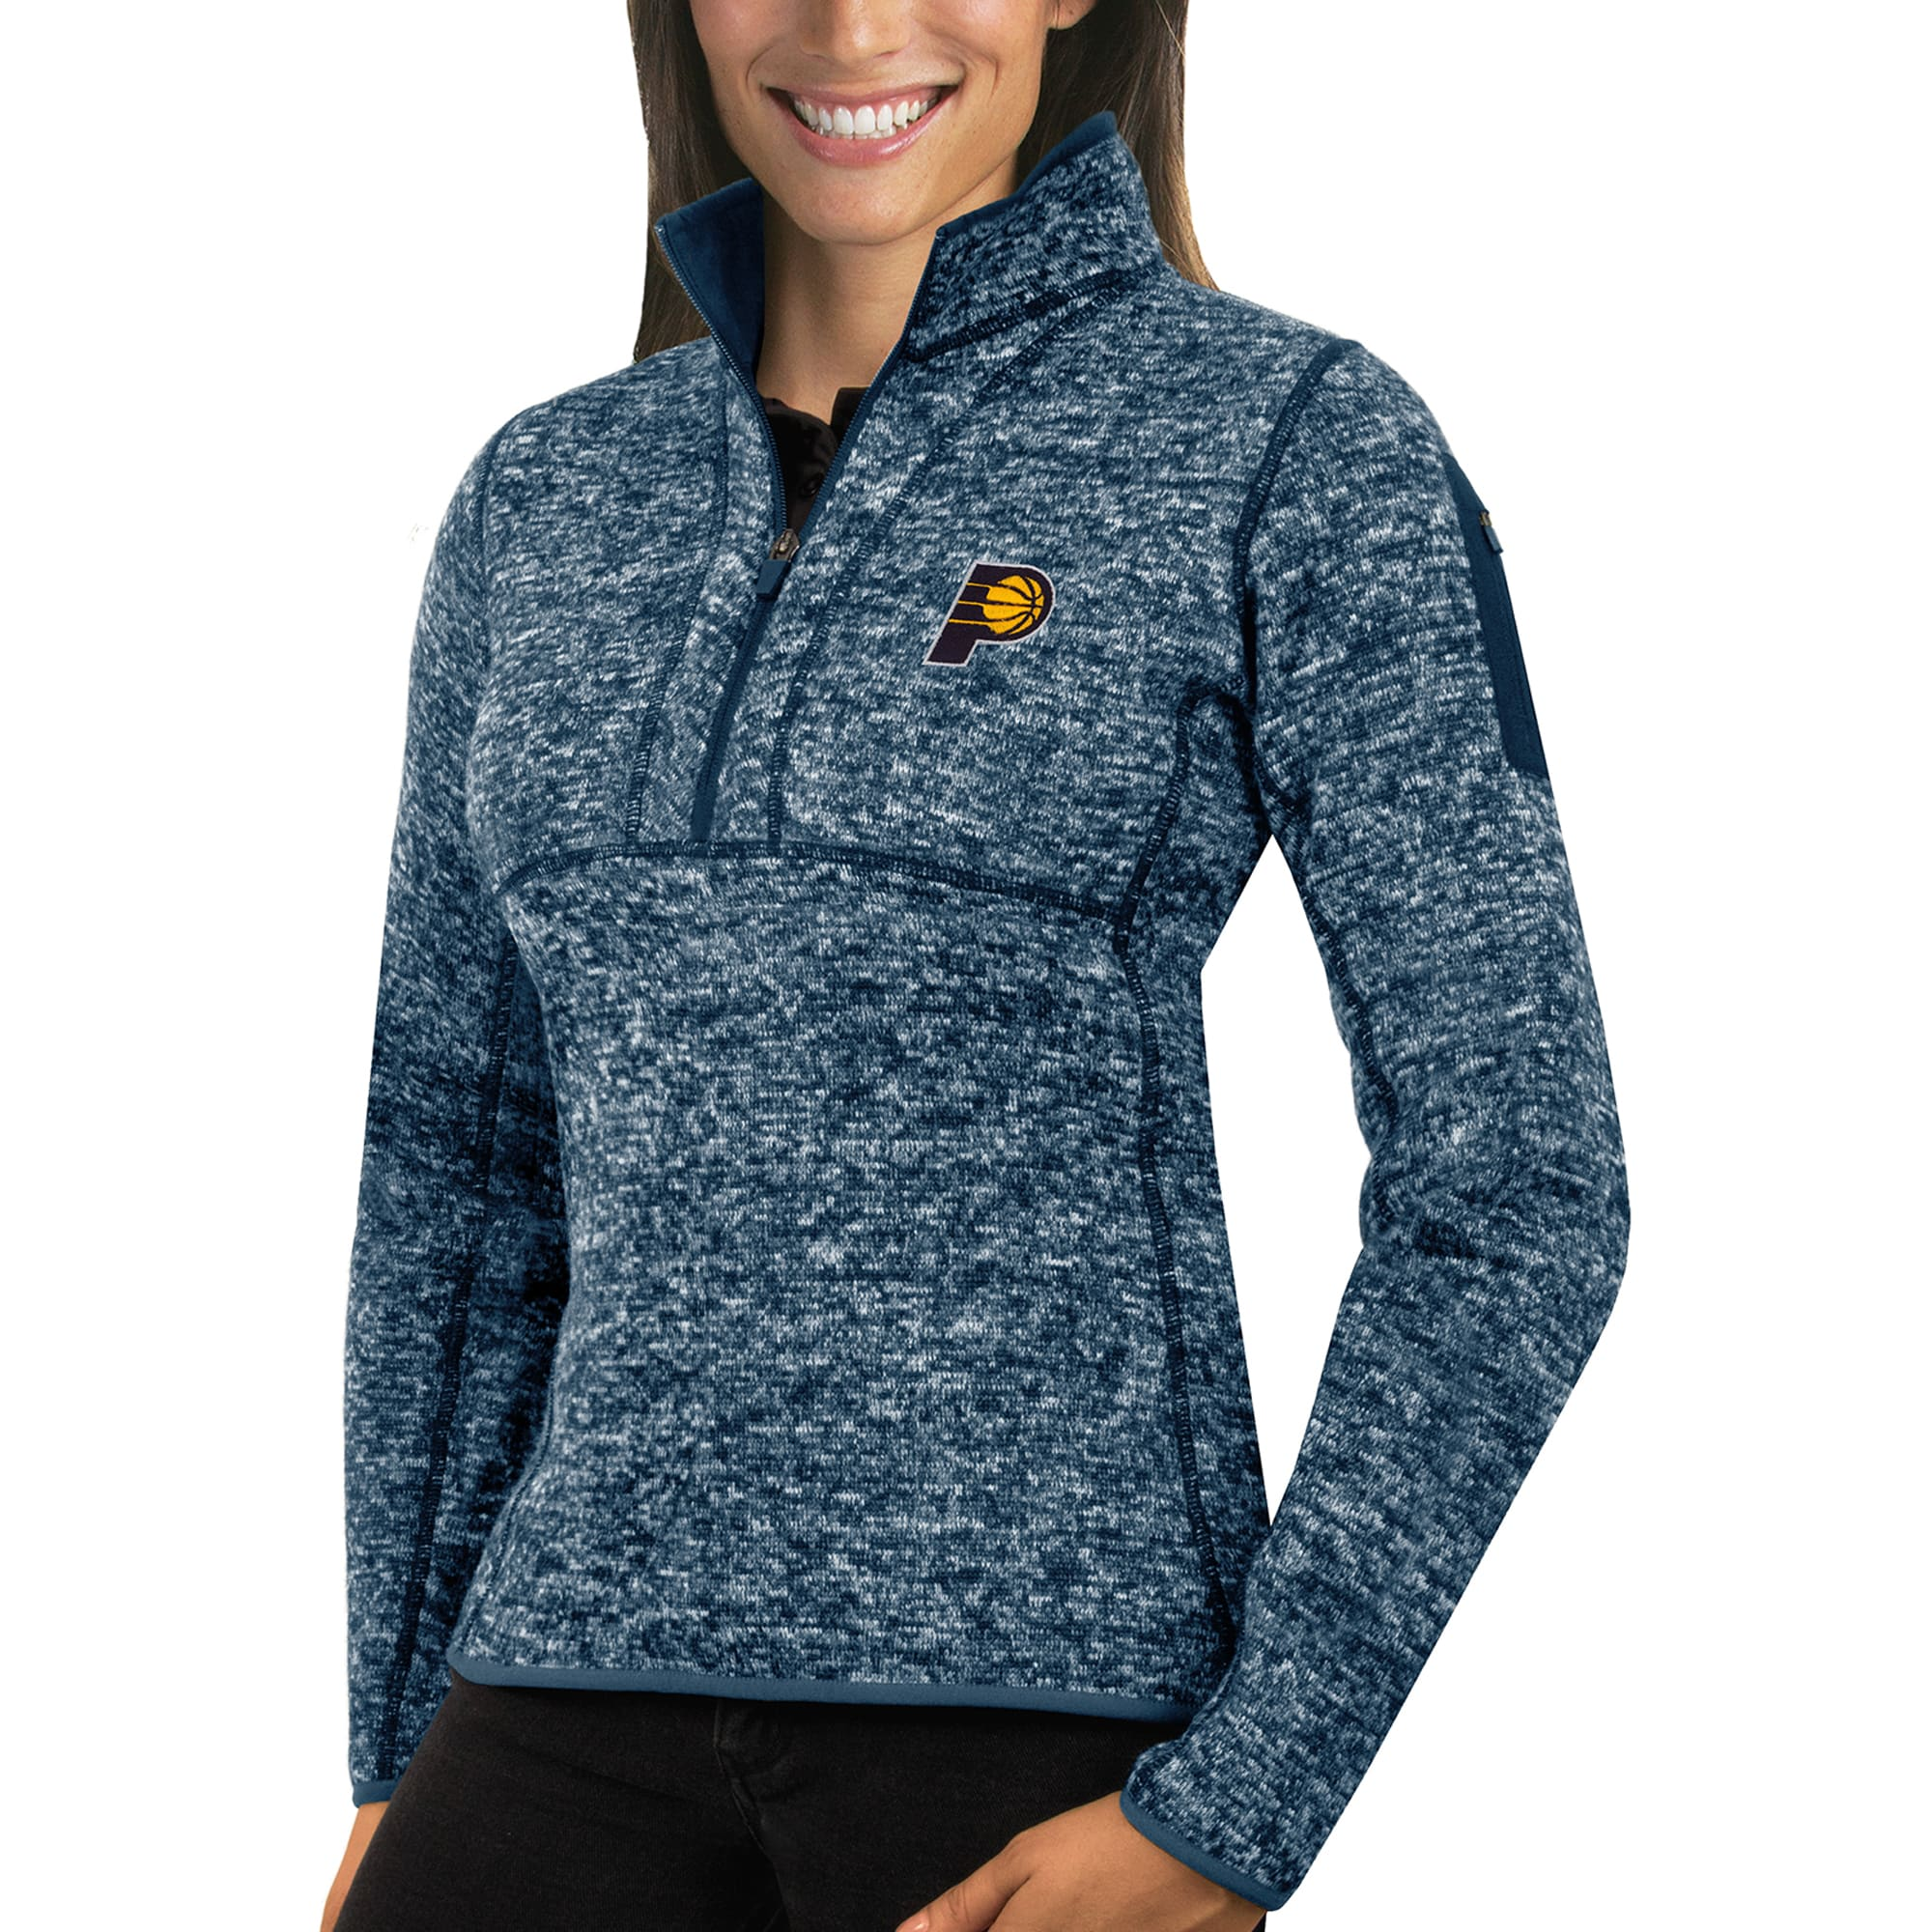 Indiana Pacers Antigua Women's Fortune Half-Zip Pullover Jacket - Heather Navy